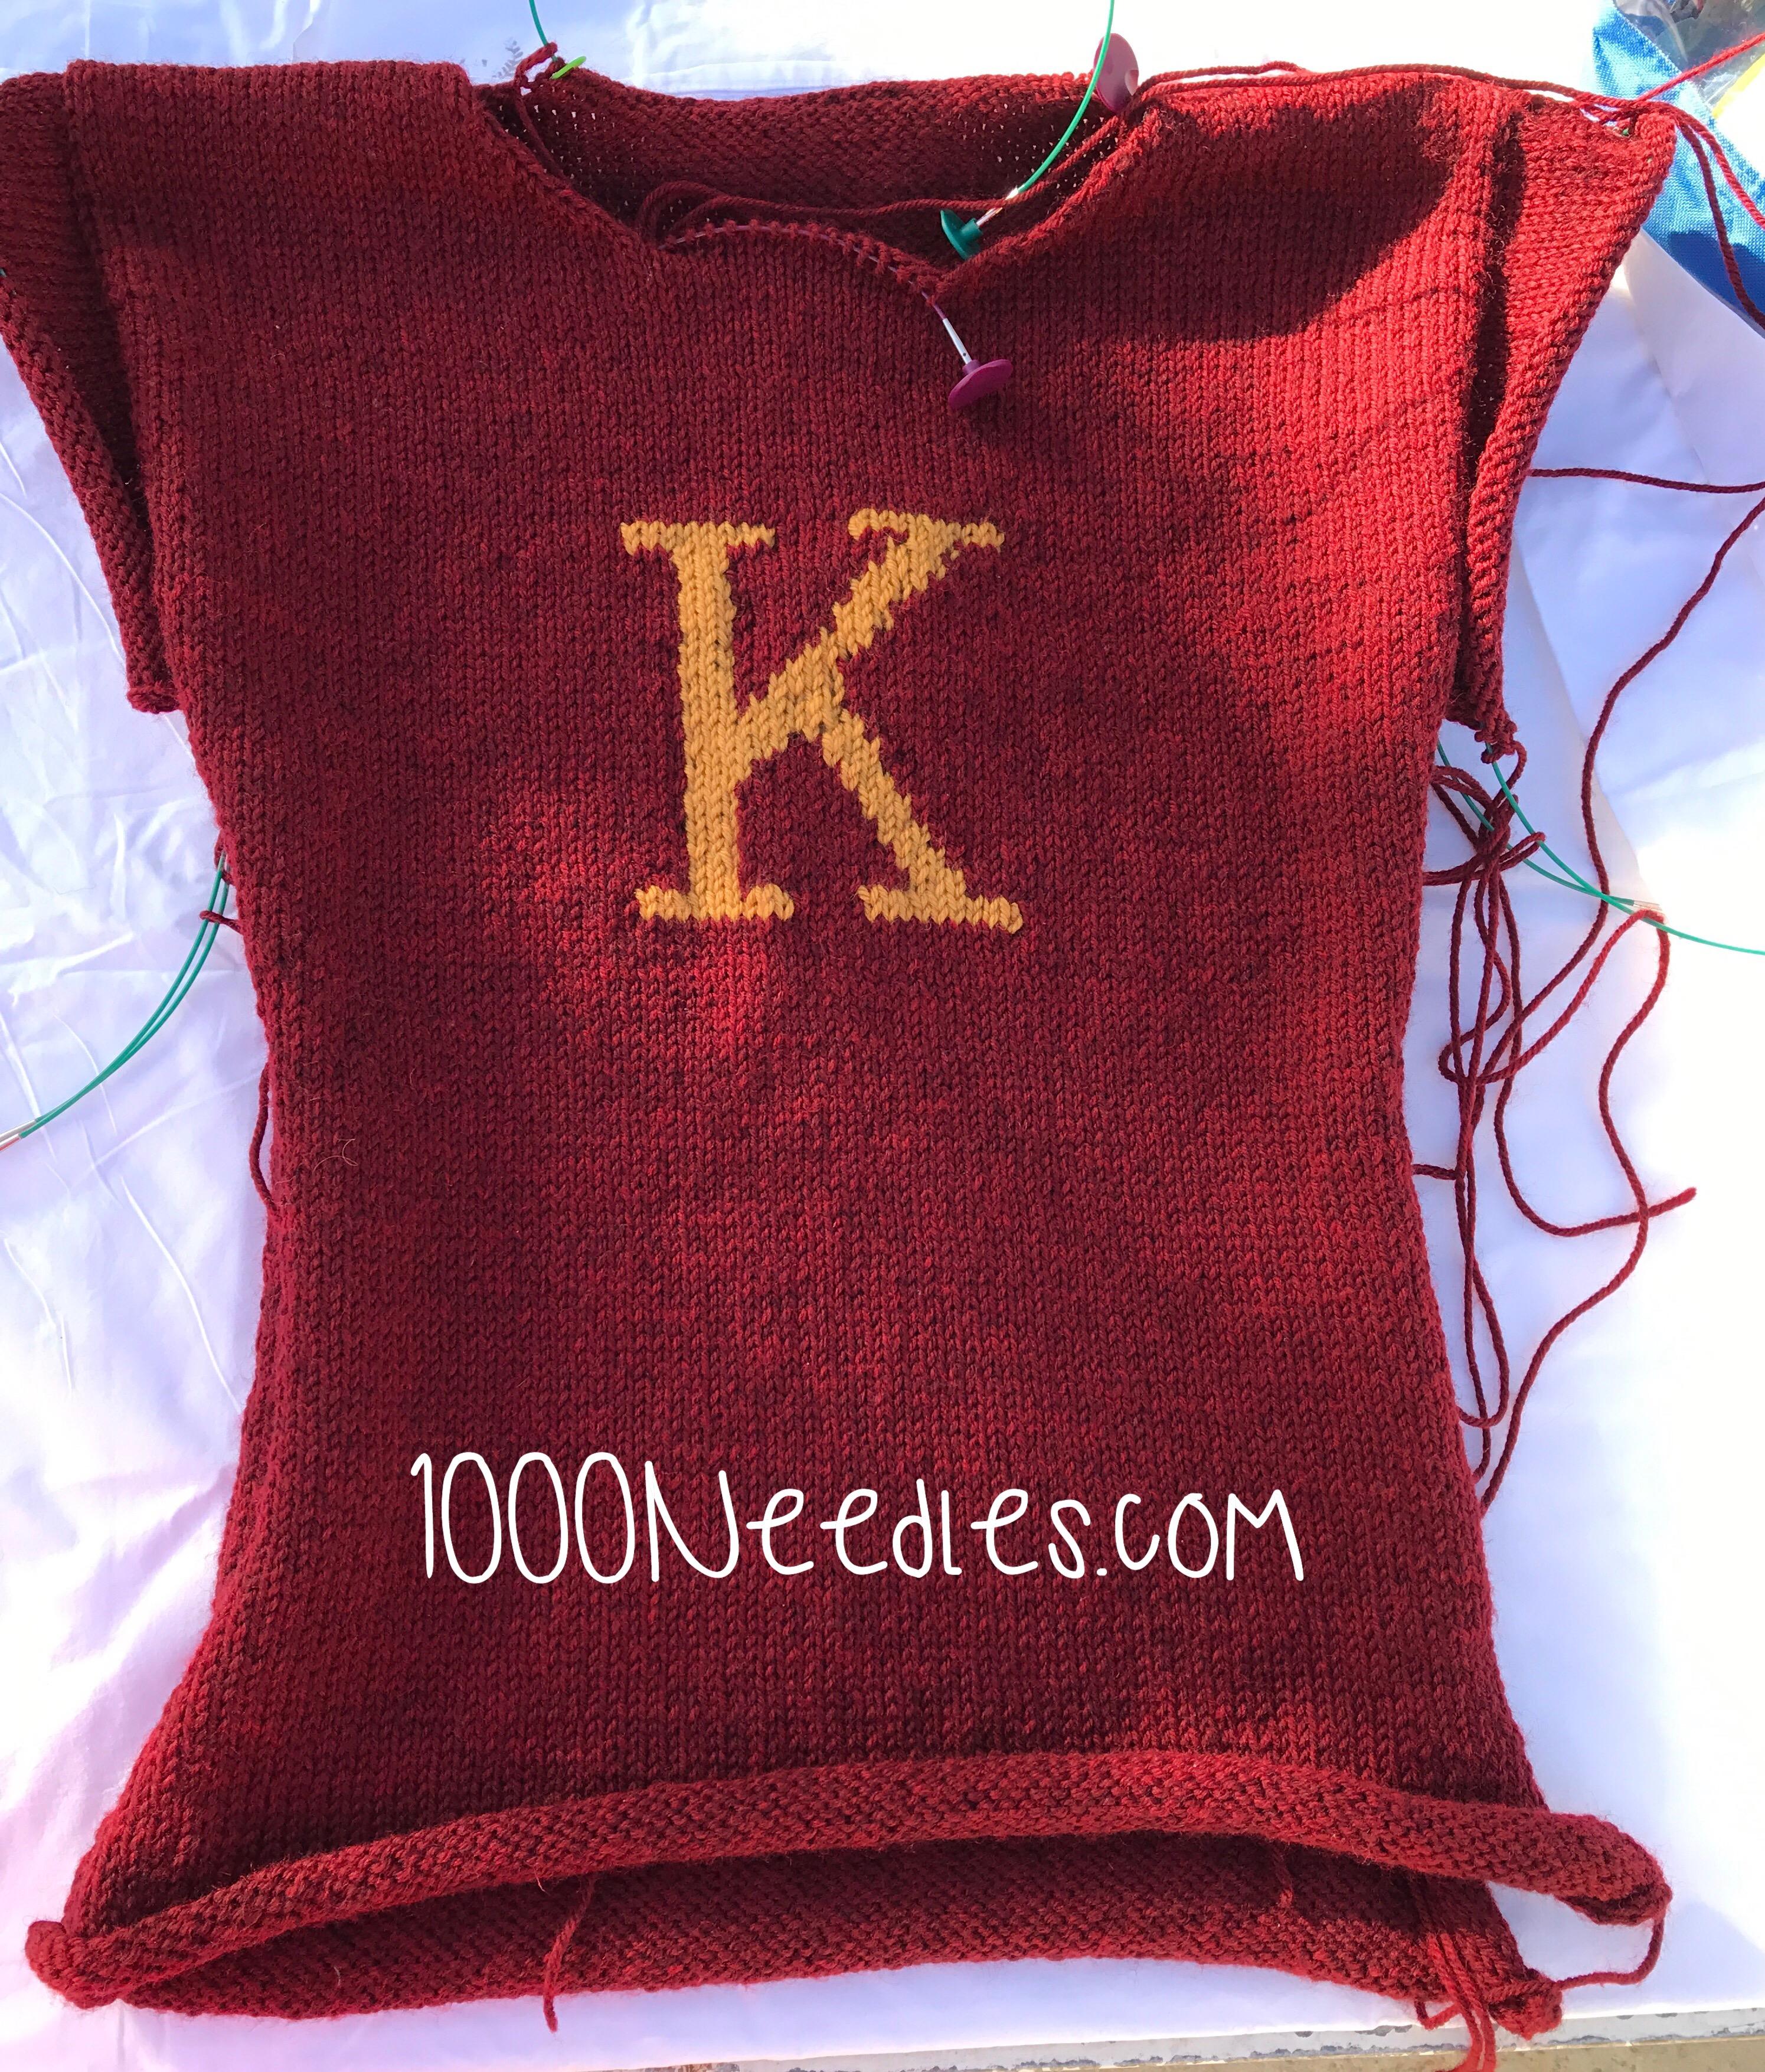 Knitting Expat Sock Club : Crafty plan february thousand needles